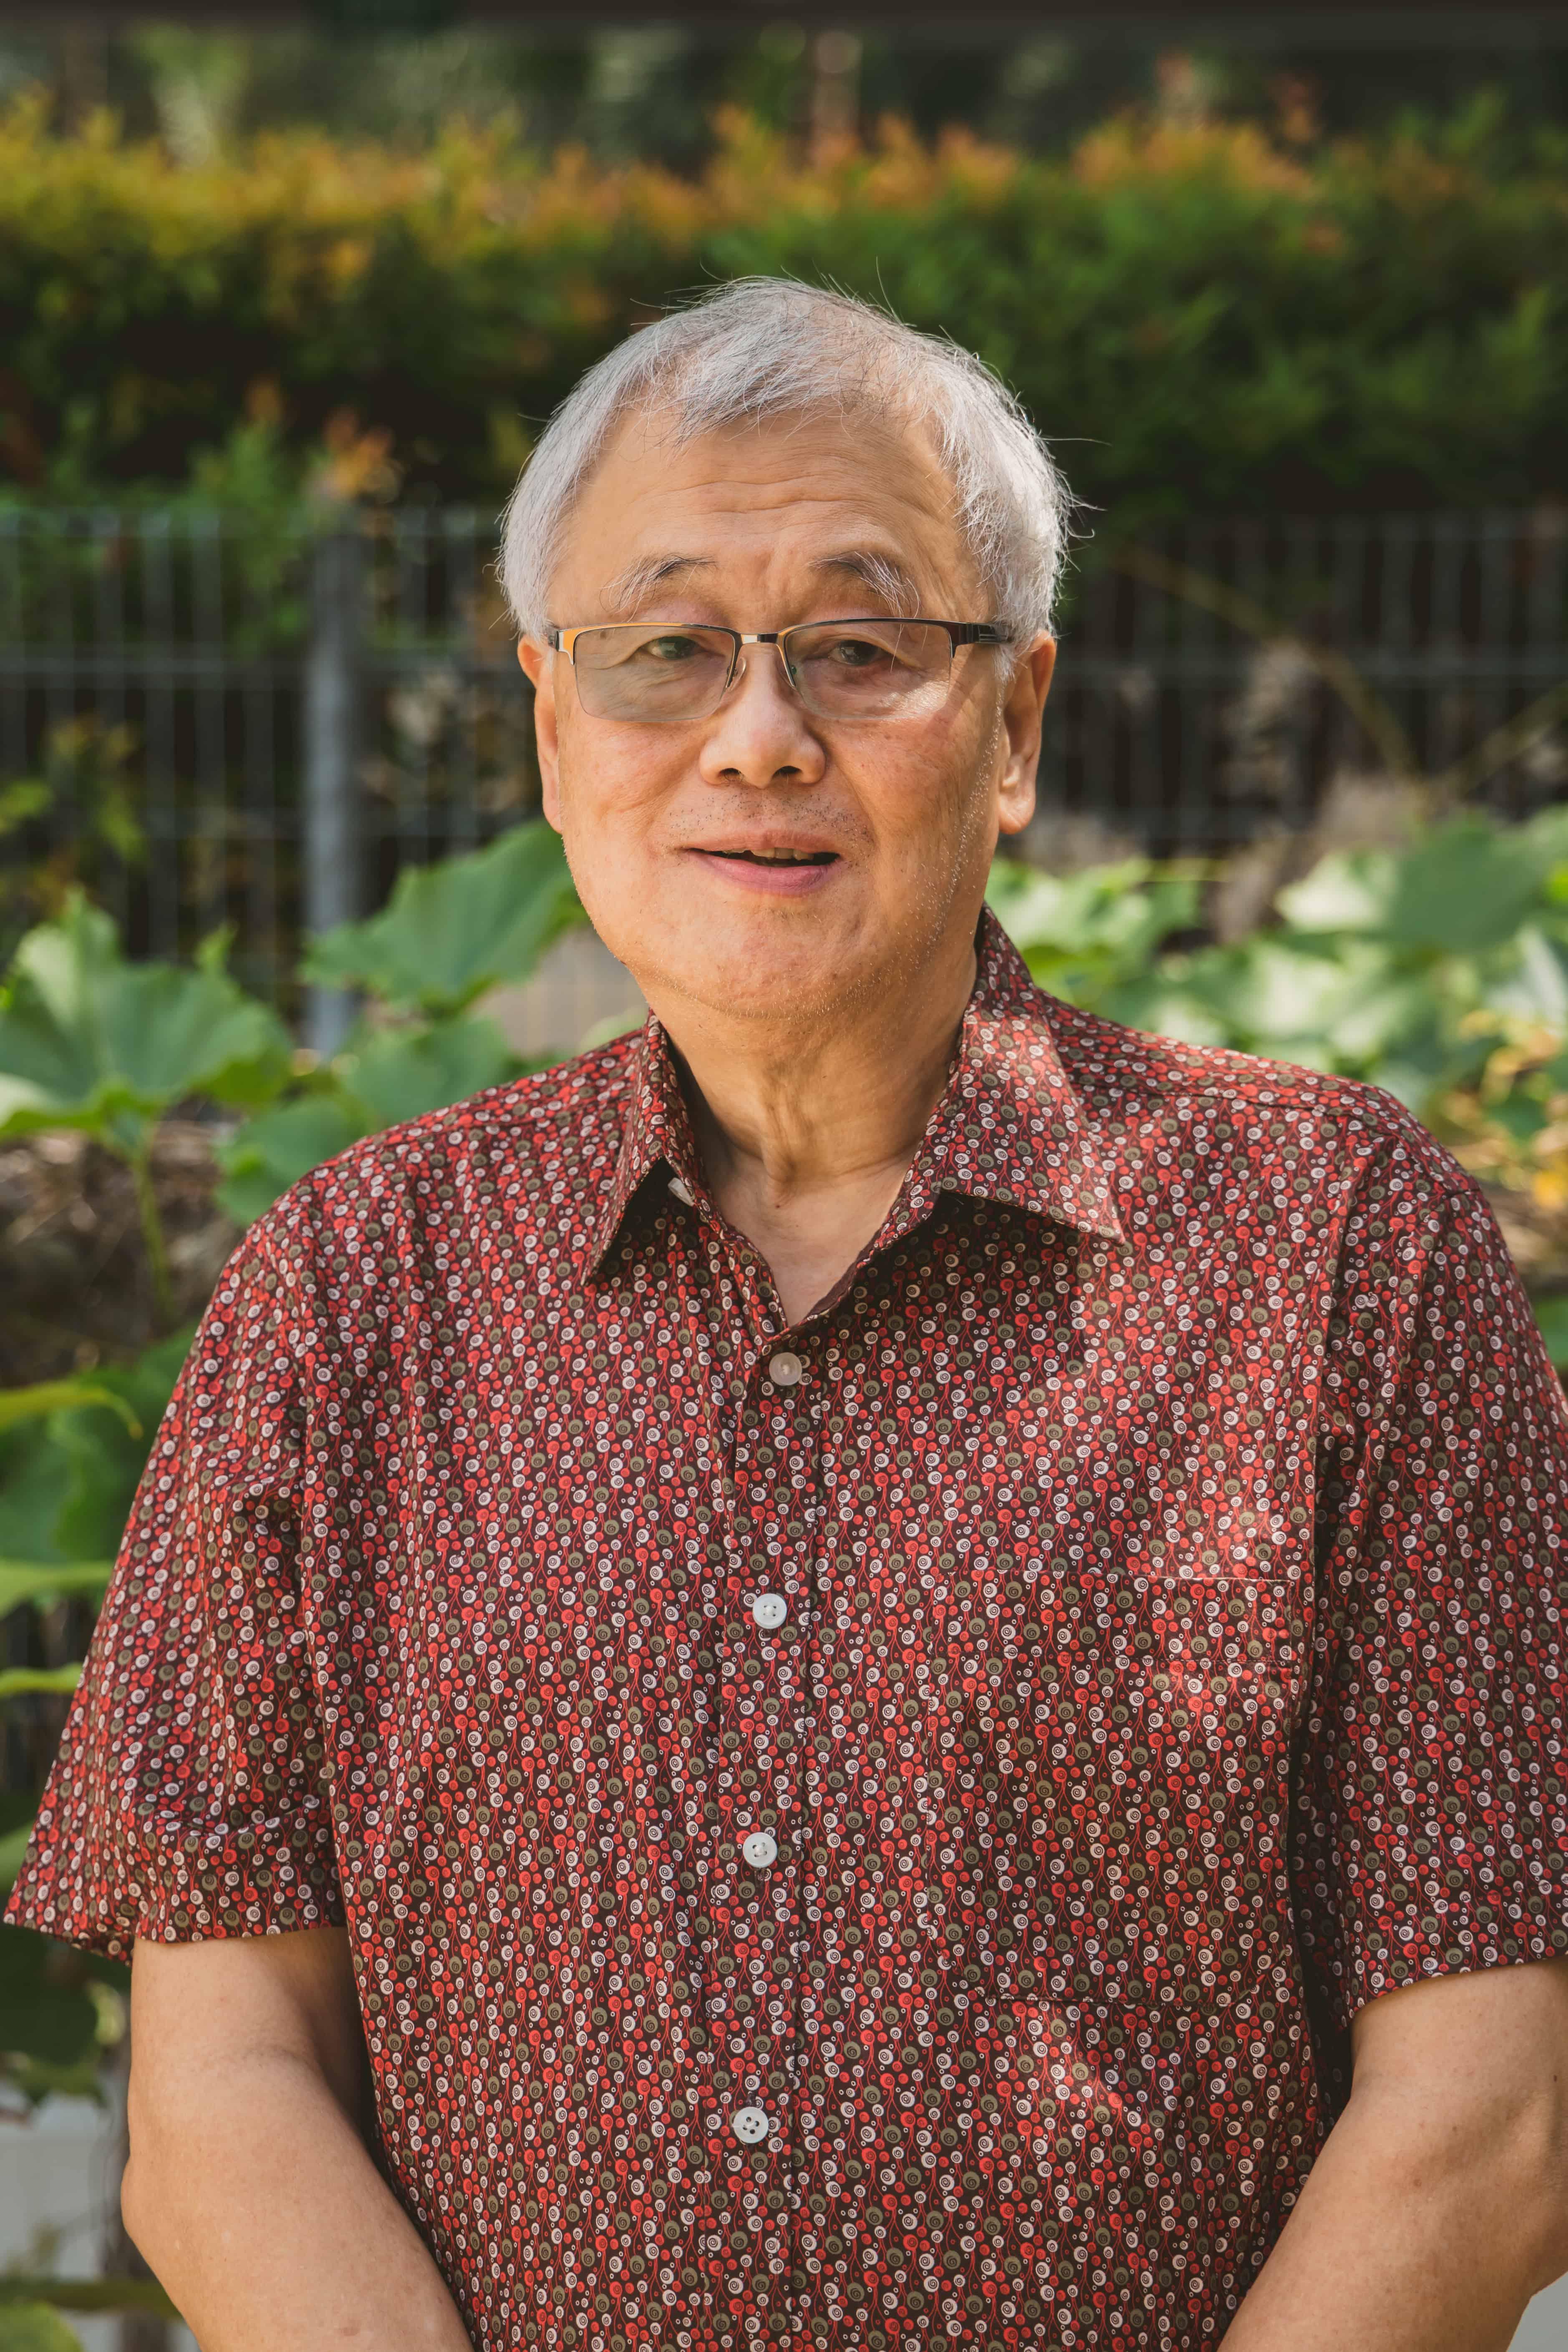 Elder Gan Tjoen Seng 颜俊生长老